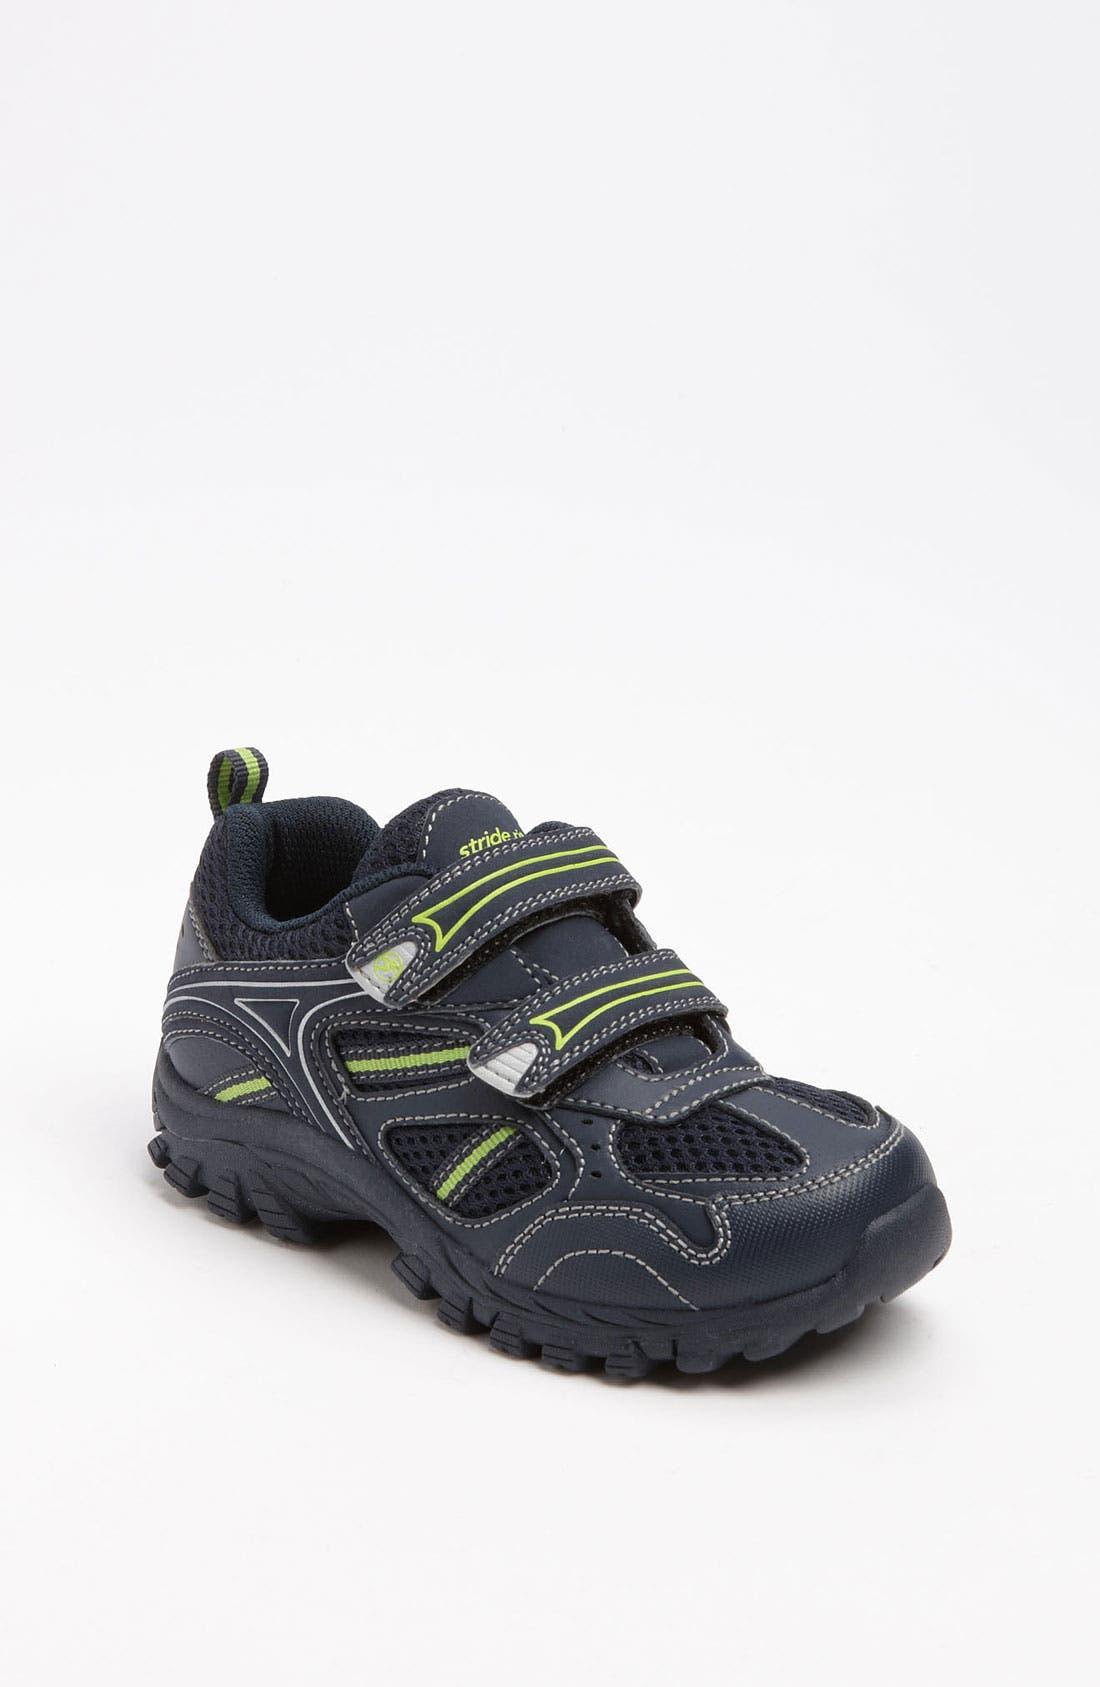 Main Image - Stride Rite 'Dallas' Sneaker (Baby, Walker, Toddler & Little Kid)